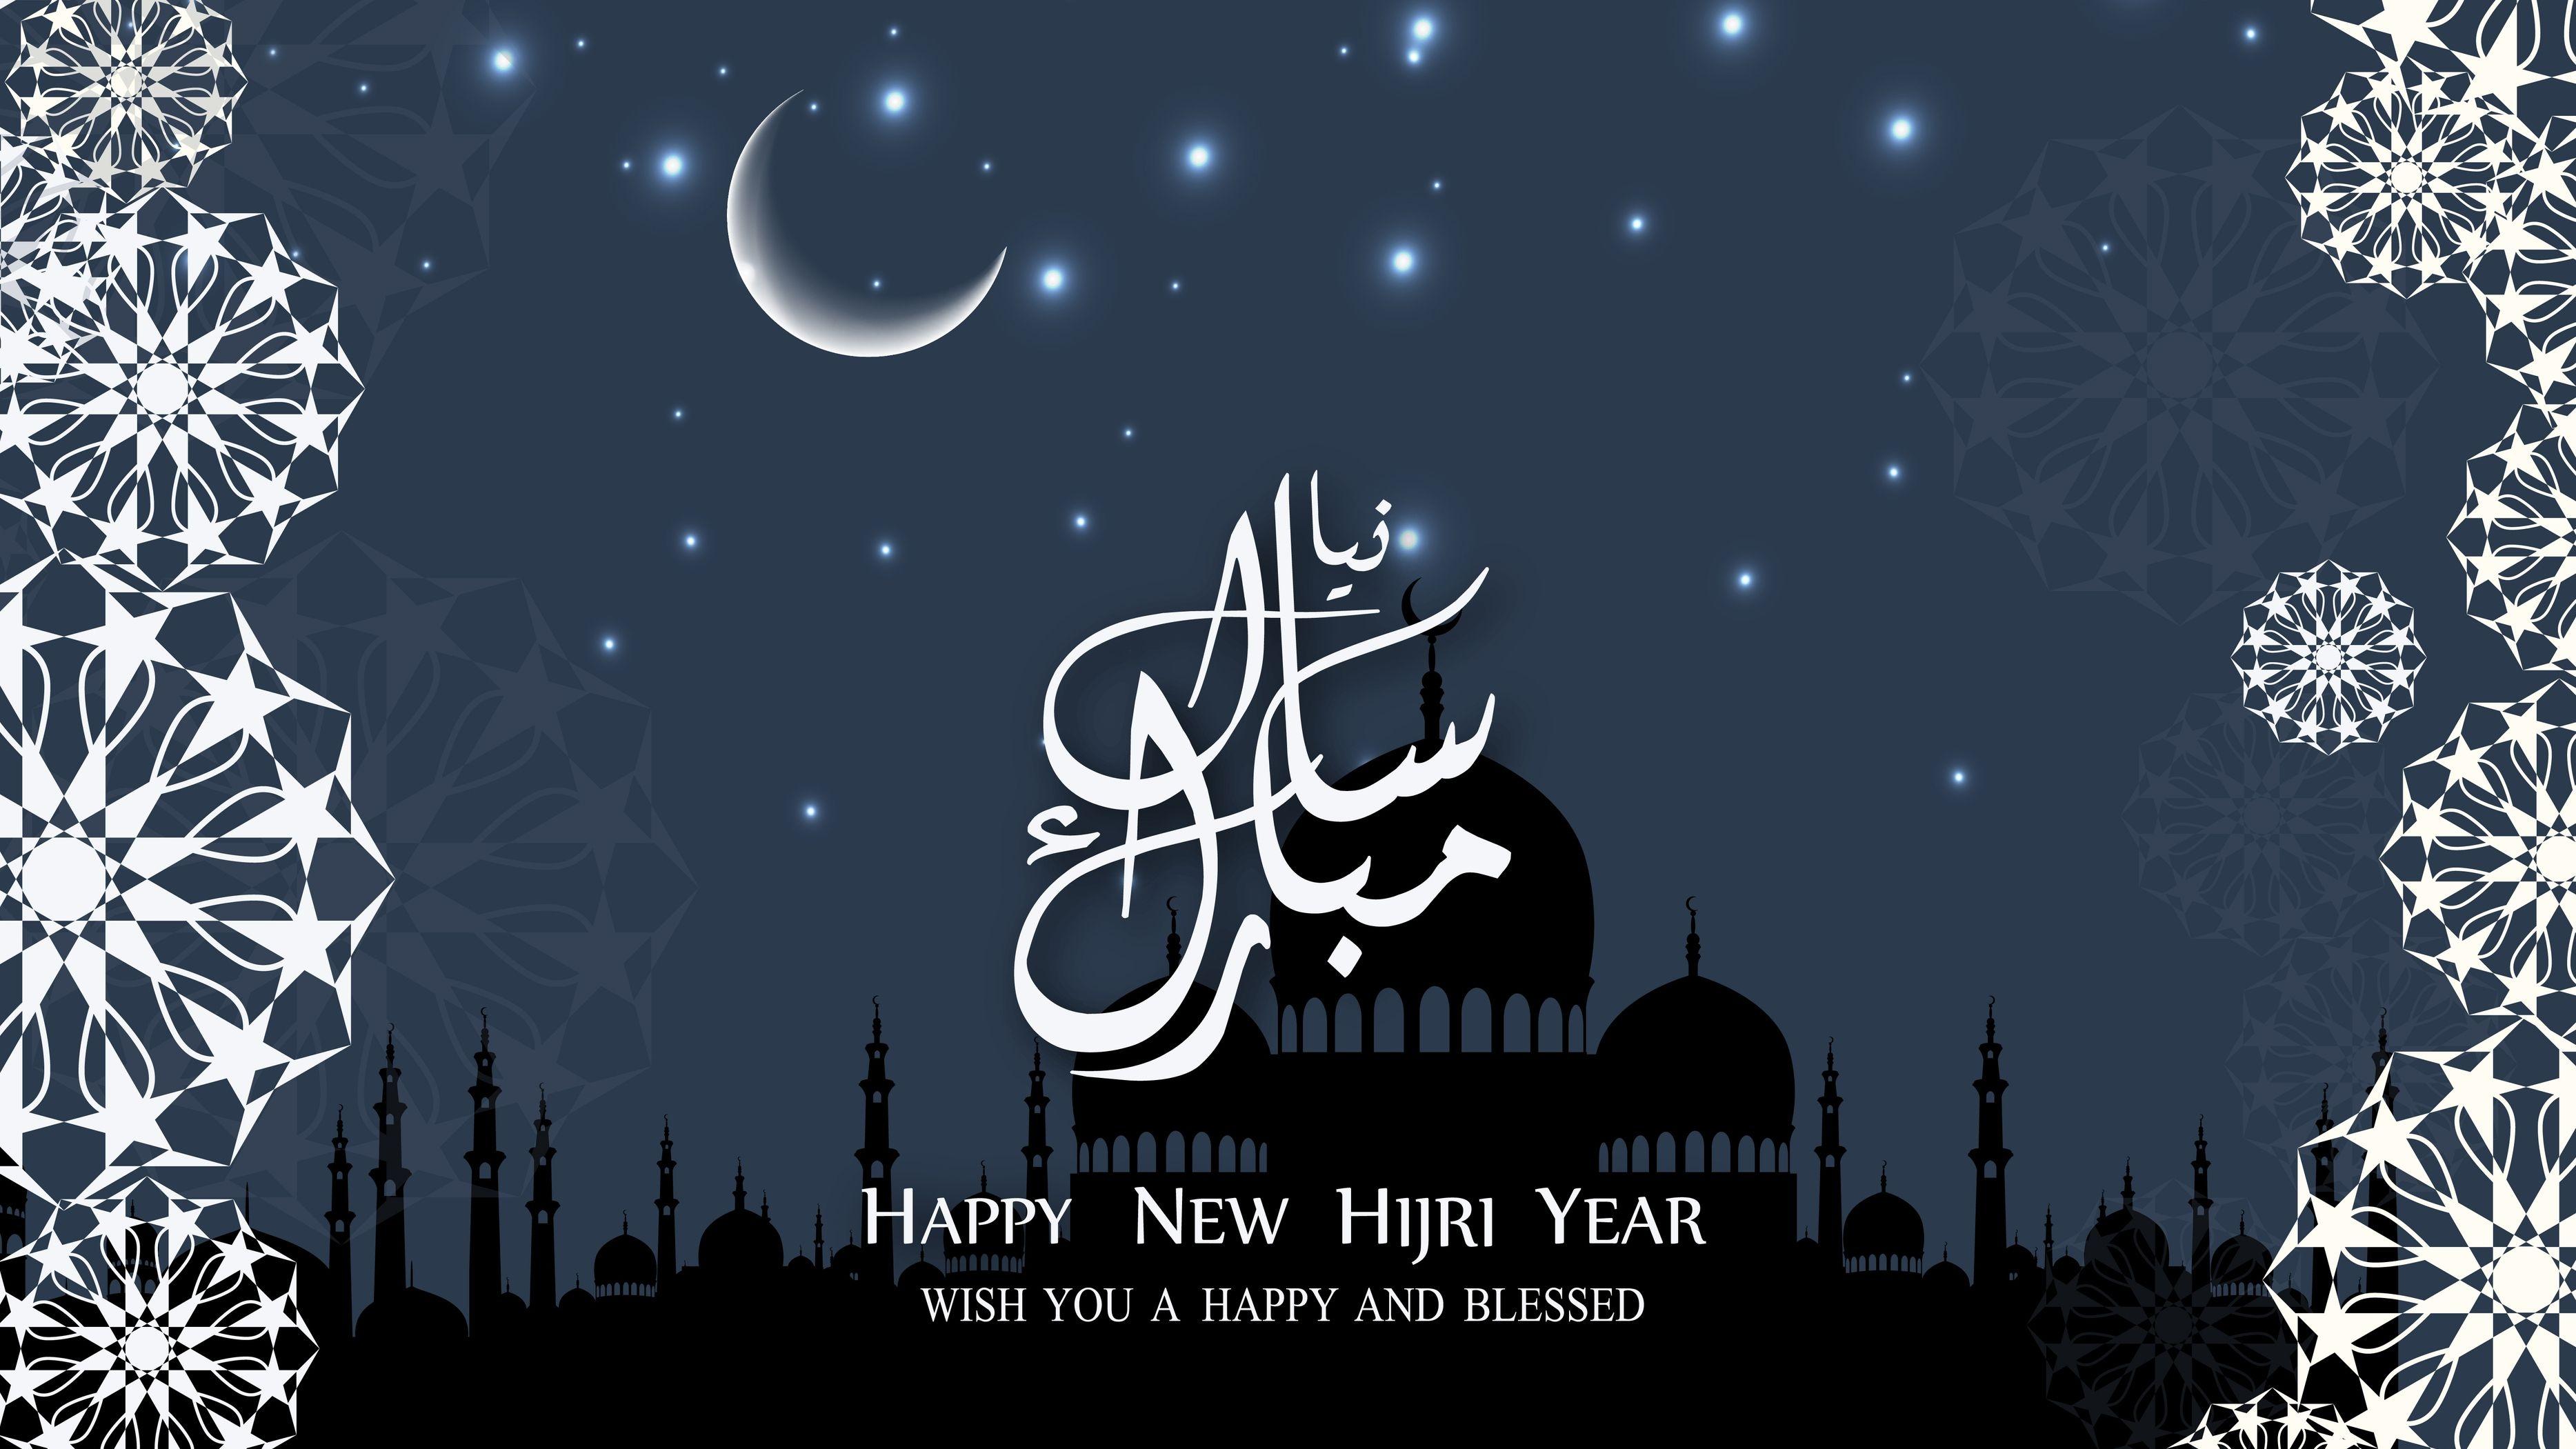 Hijri Islamic New Year 1441 Greeting in Arabic,Urdu,English